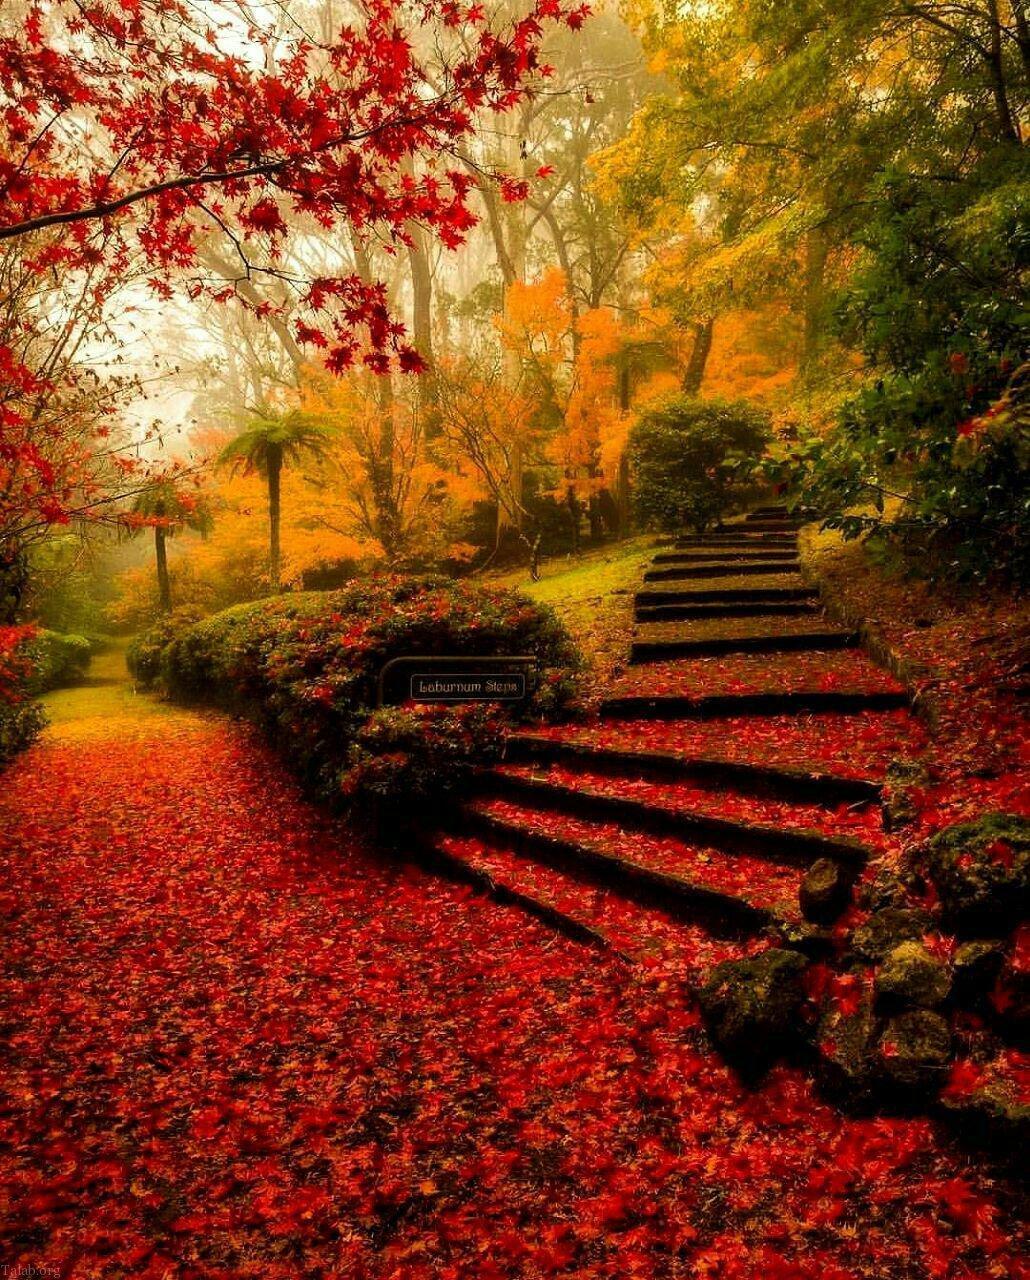 اس ام اس عاشقانه فصل پاییز | نوشته و شعر عاشقانه پاییز